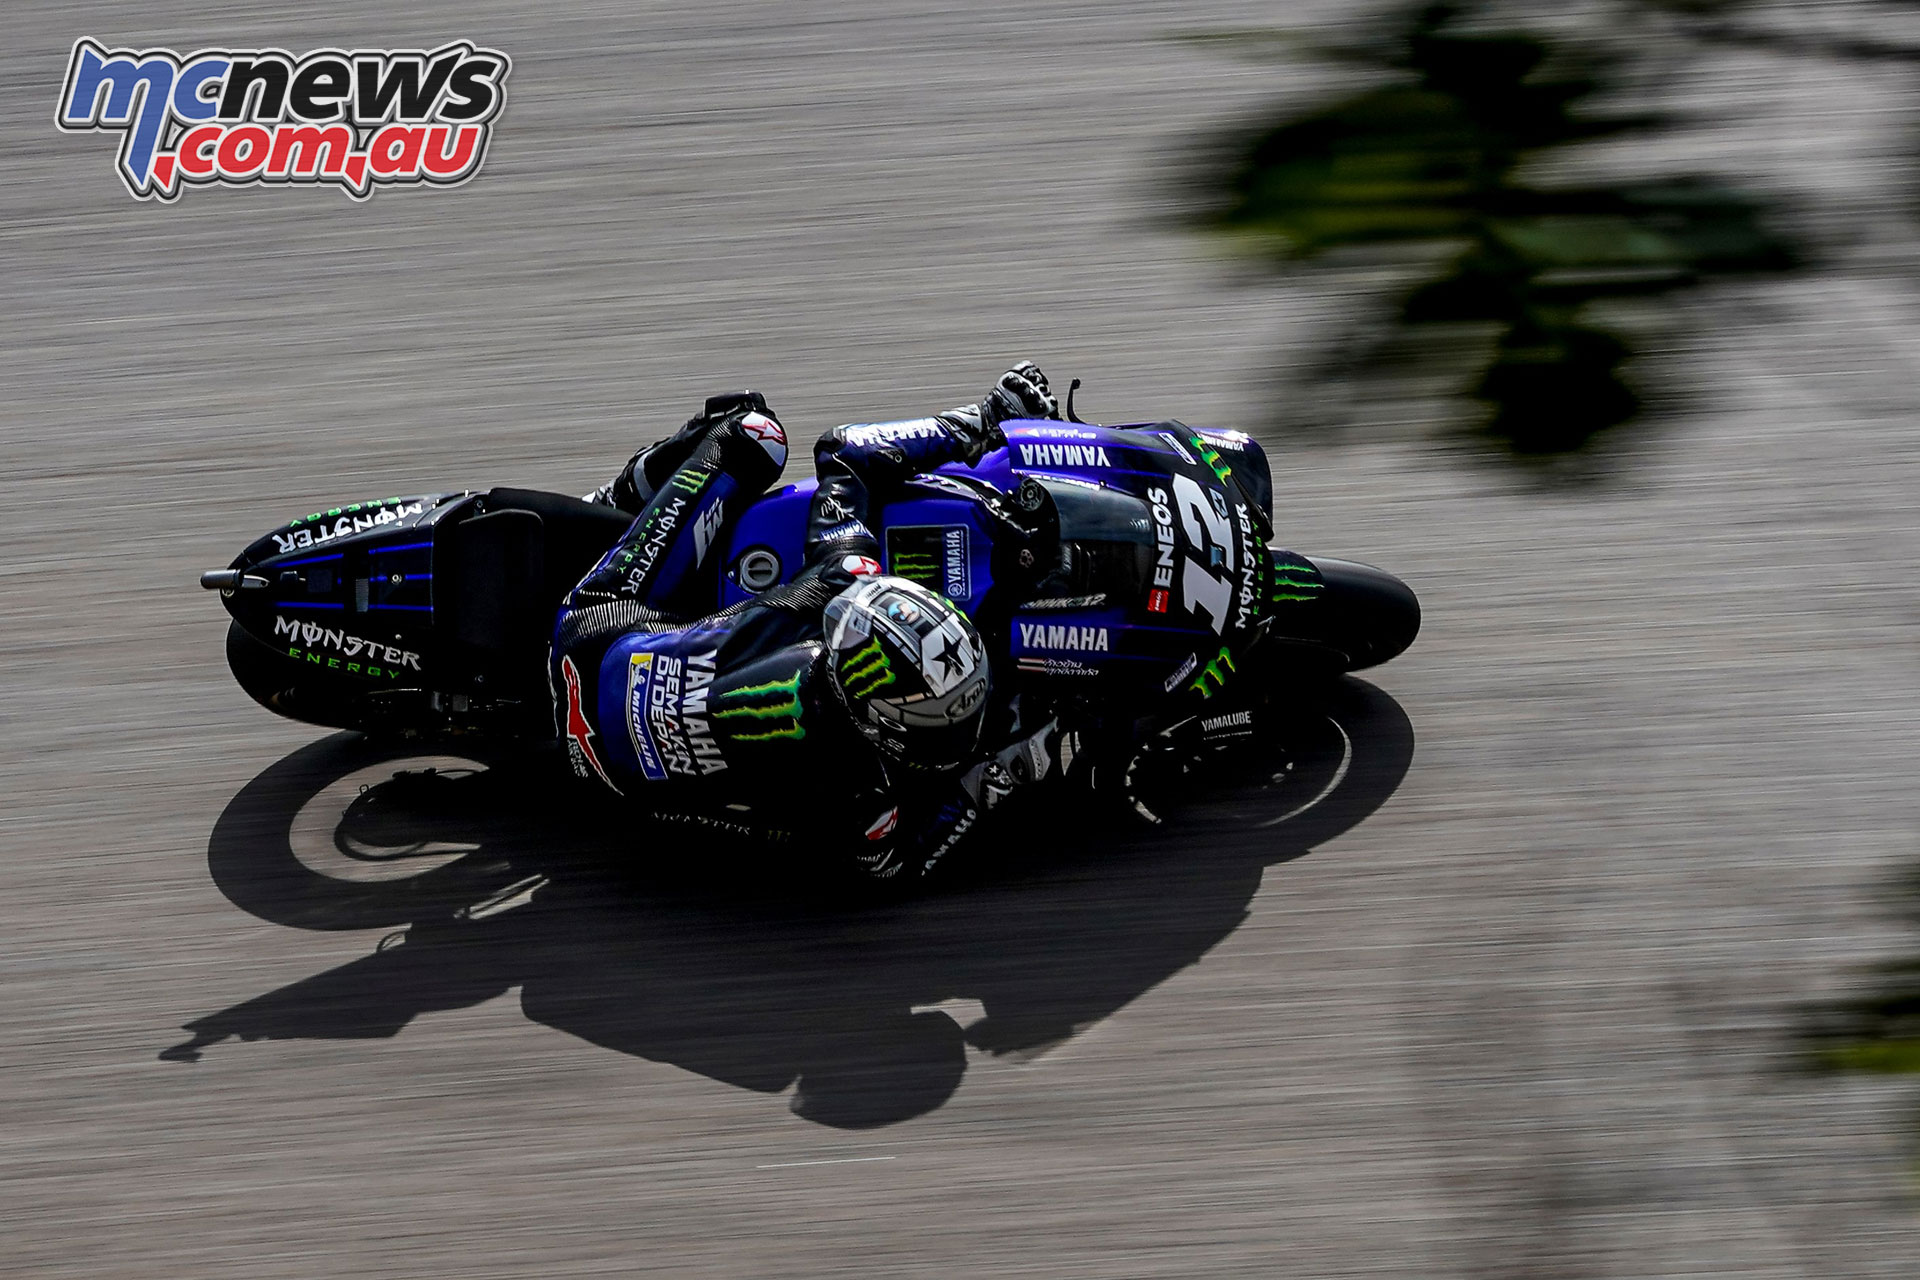 MotoGP Rnd Sachsenring Germany Maverick Vinales